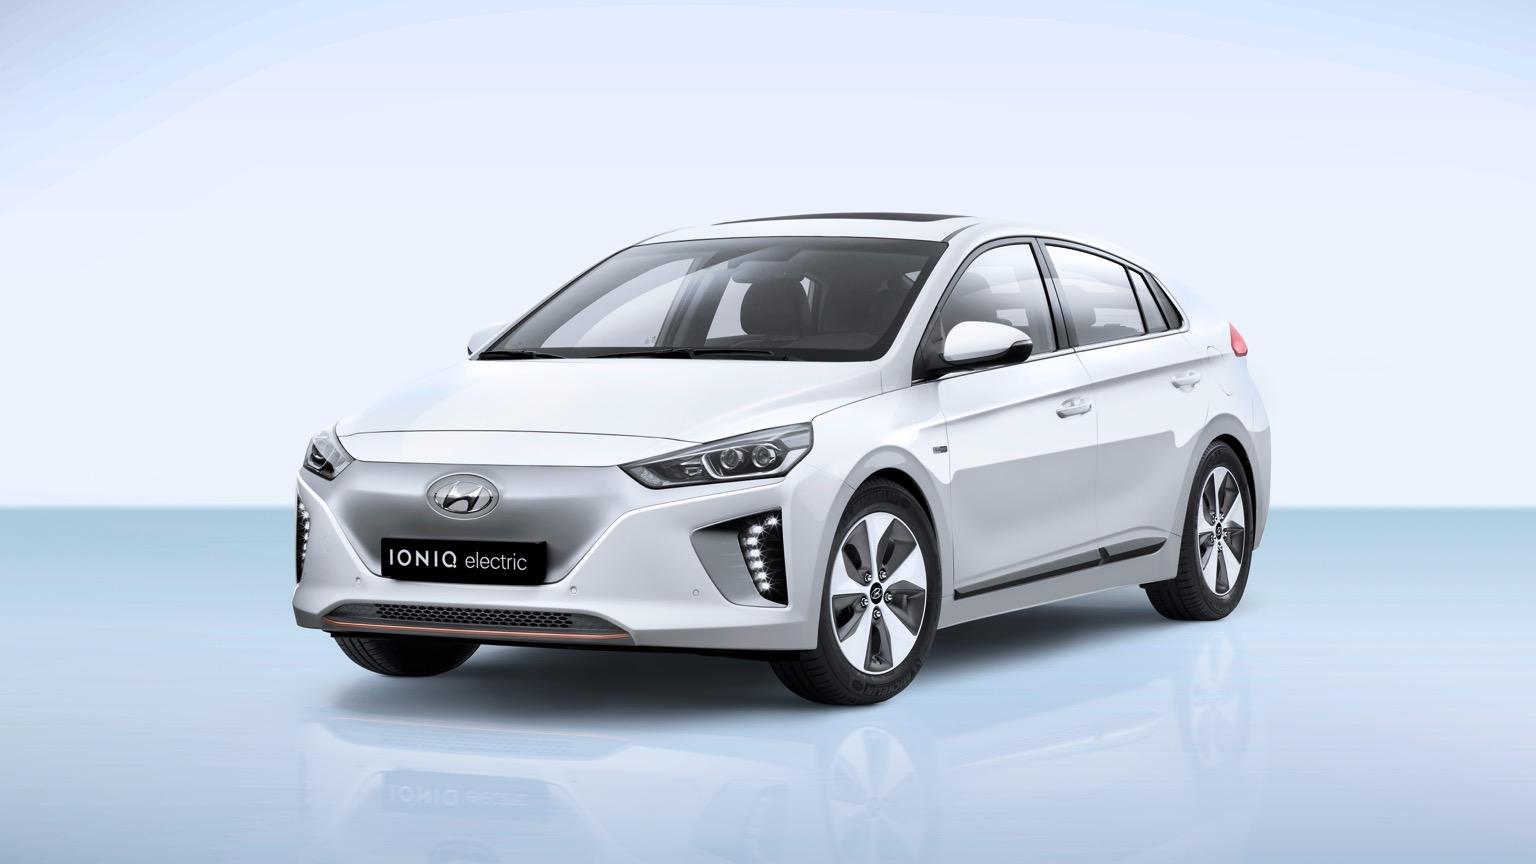 Hyundai IONIQ Electric (2016)